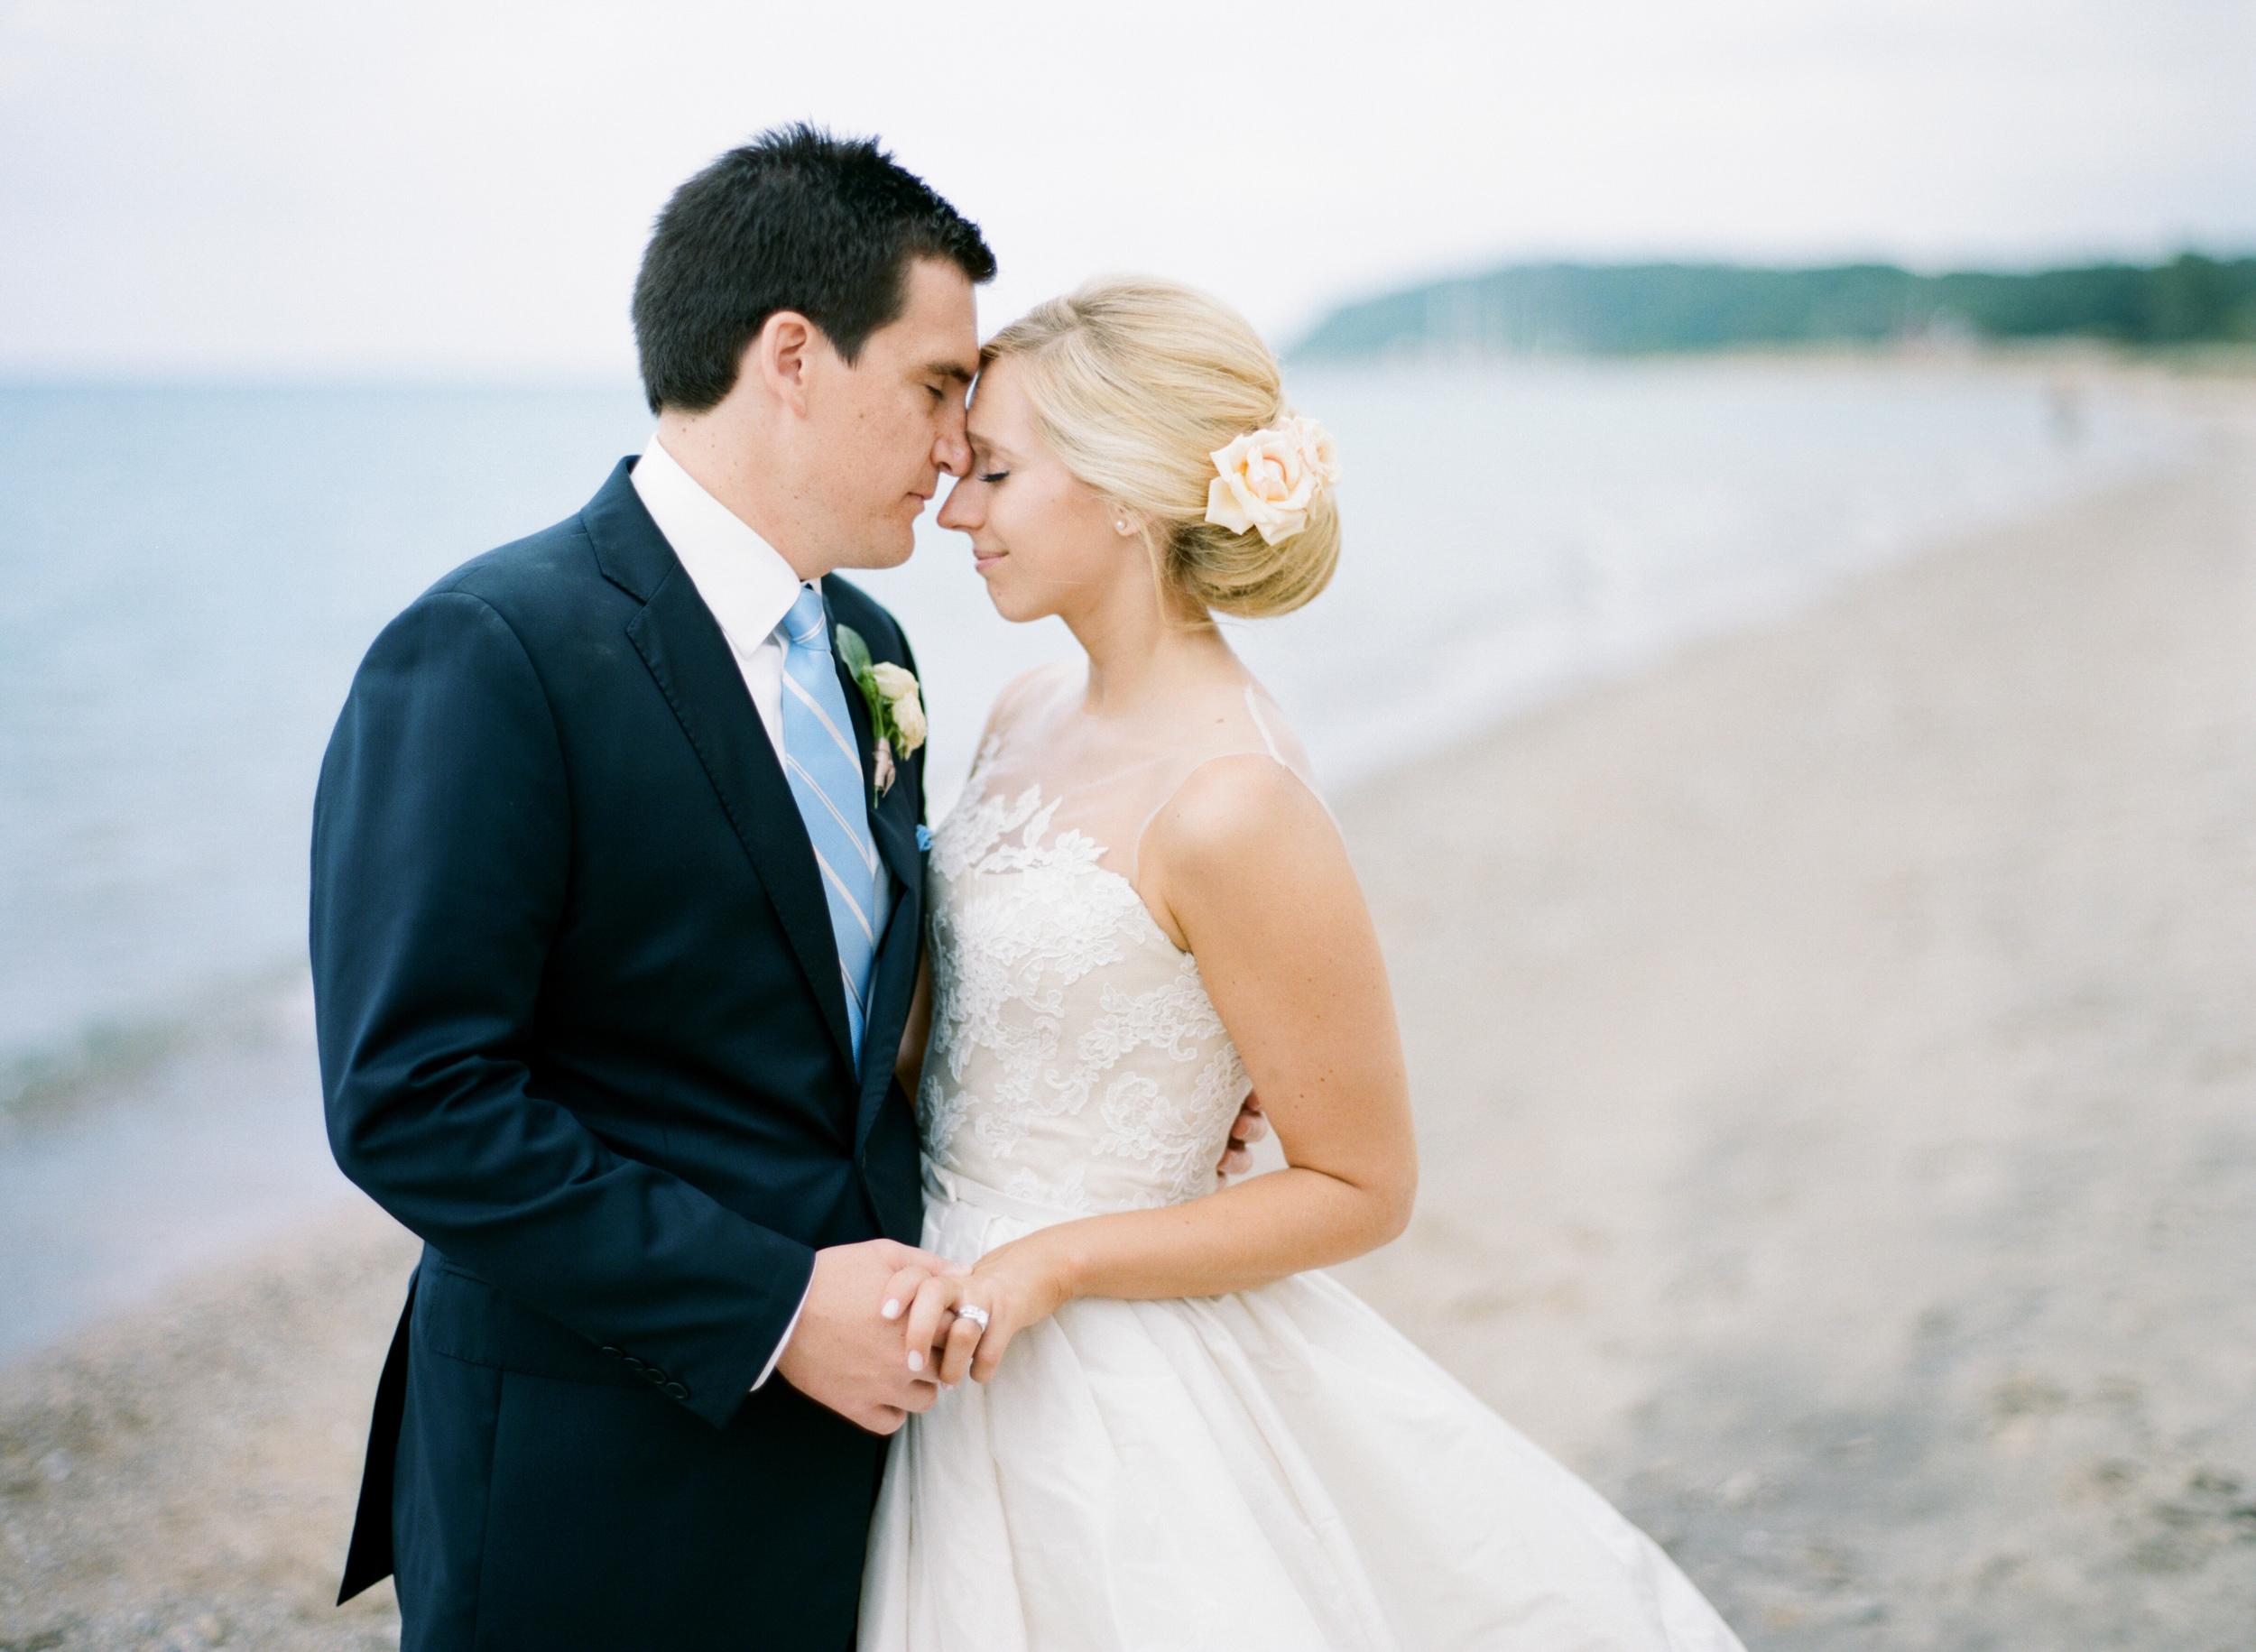 Genevieve & Scott